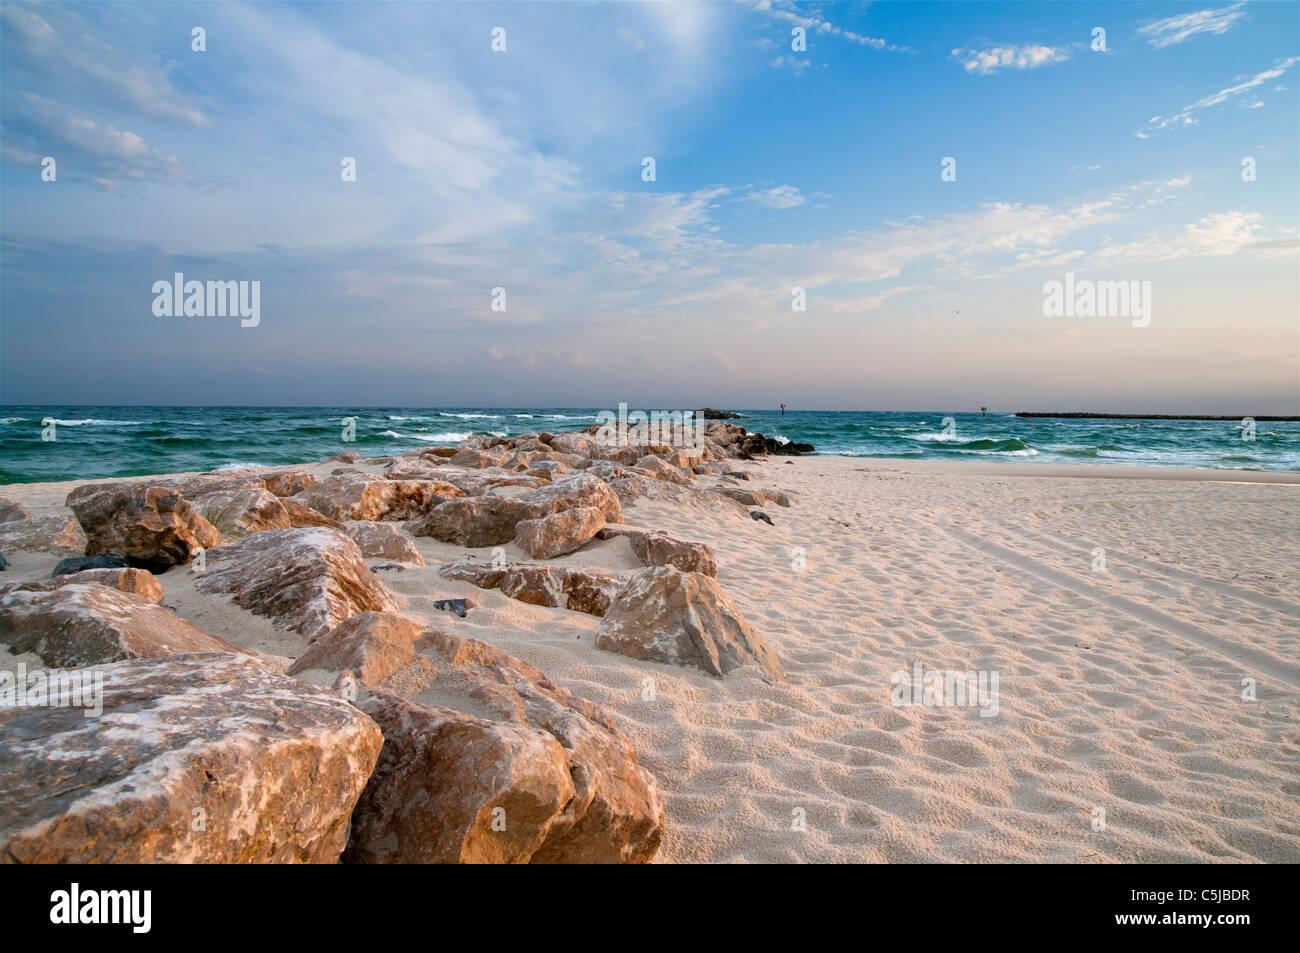 A scene from the Alabama Gulf Coast. - Stock Image